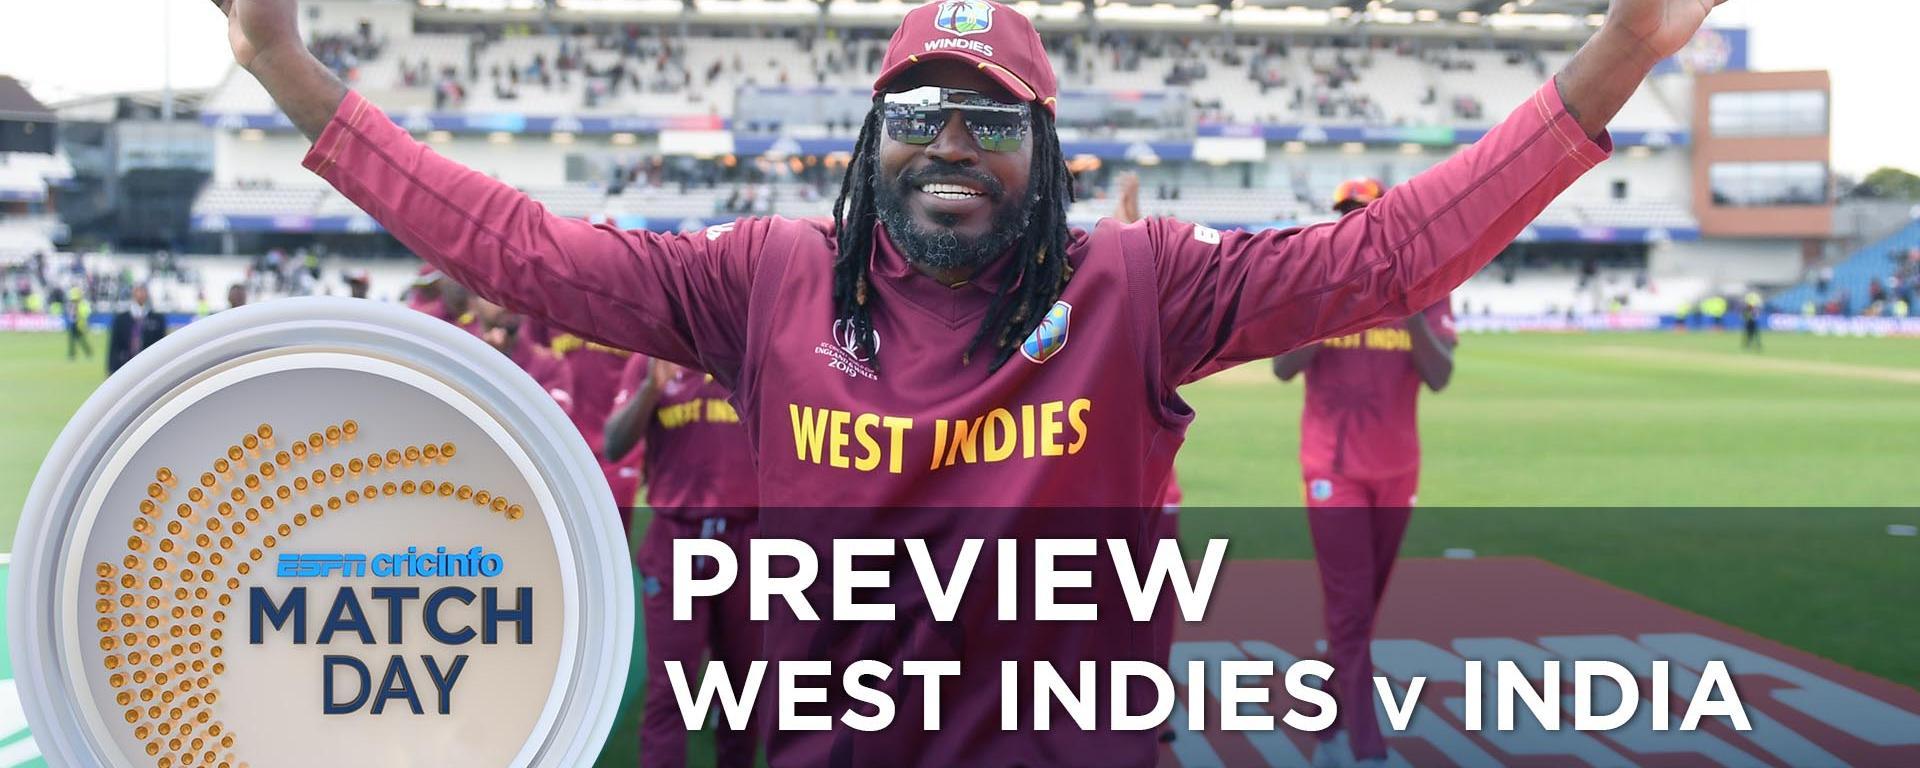 India beat West Indies by 59 runs (D/L method) - West Indies